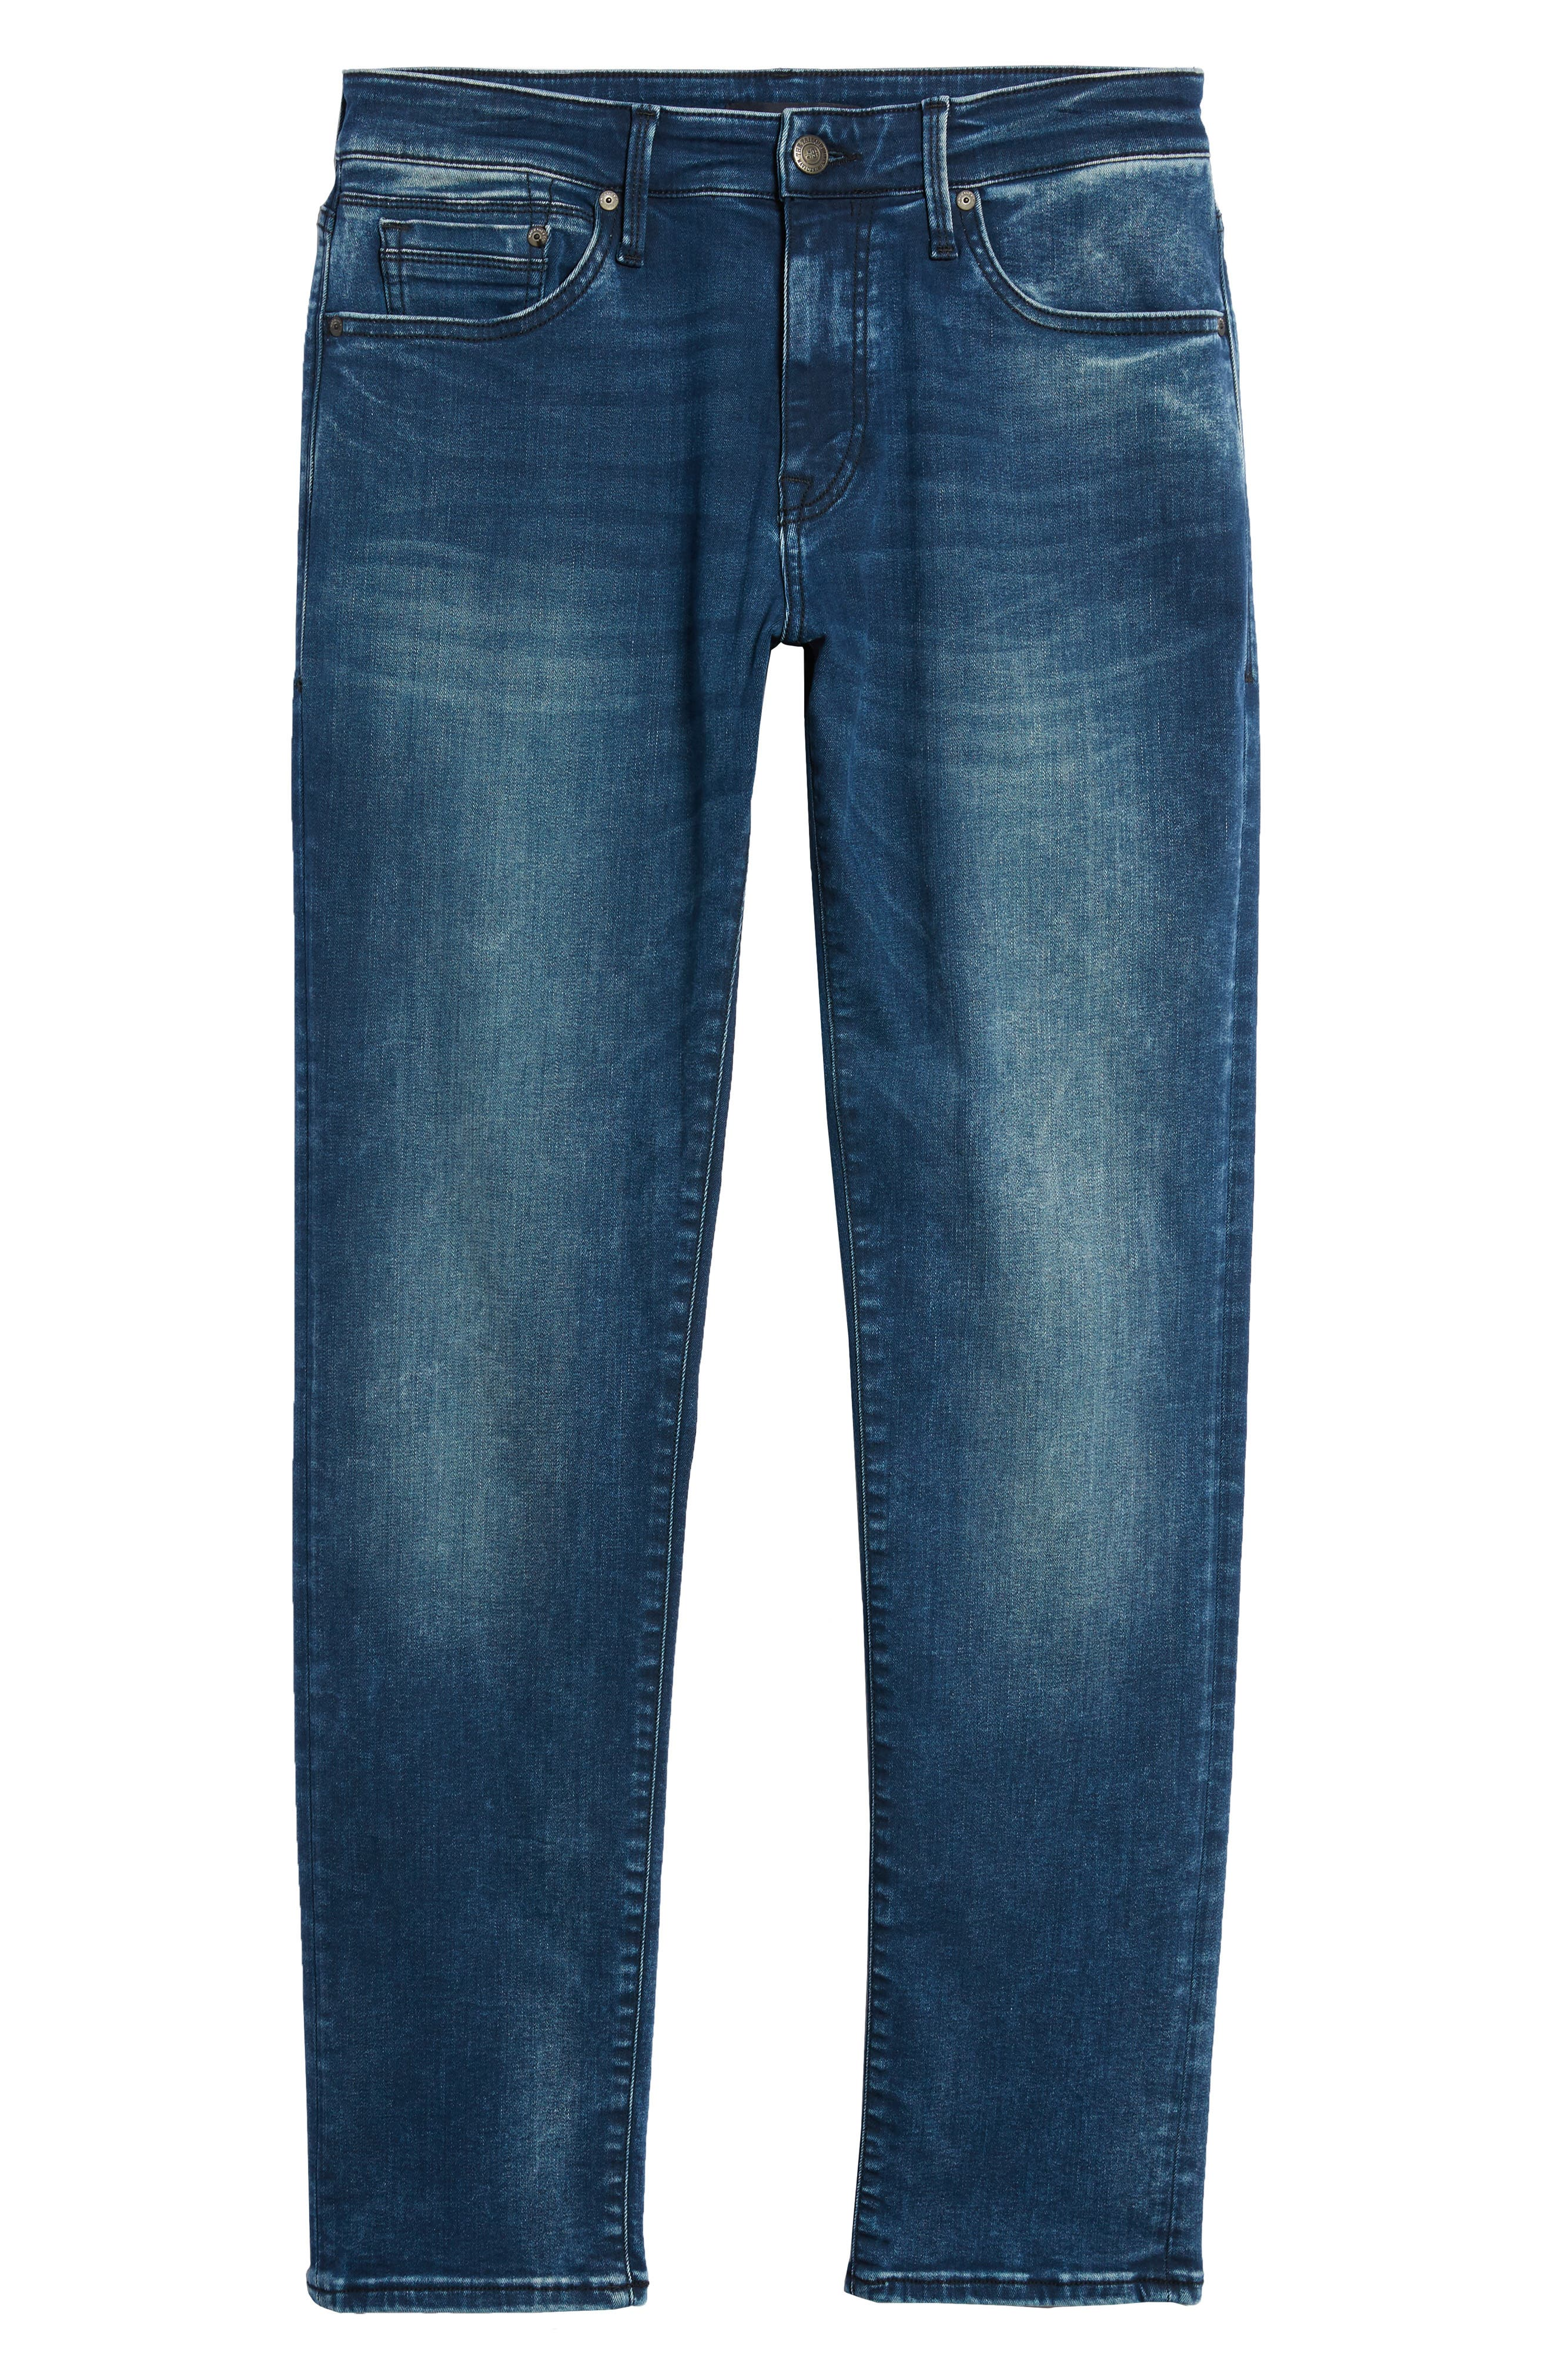 Marcus Slim Straight Leg Jeans,                             Alternate thumbnail 6, color,                             Forest Blue Williamsburg